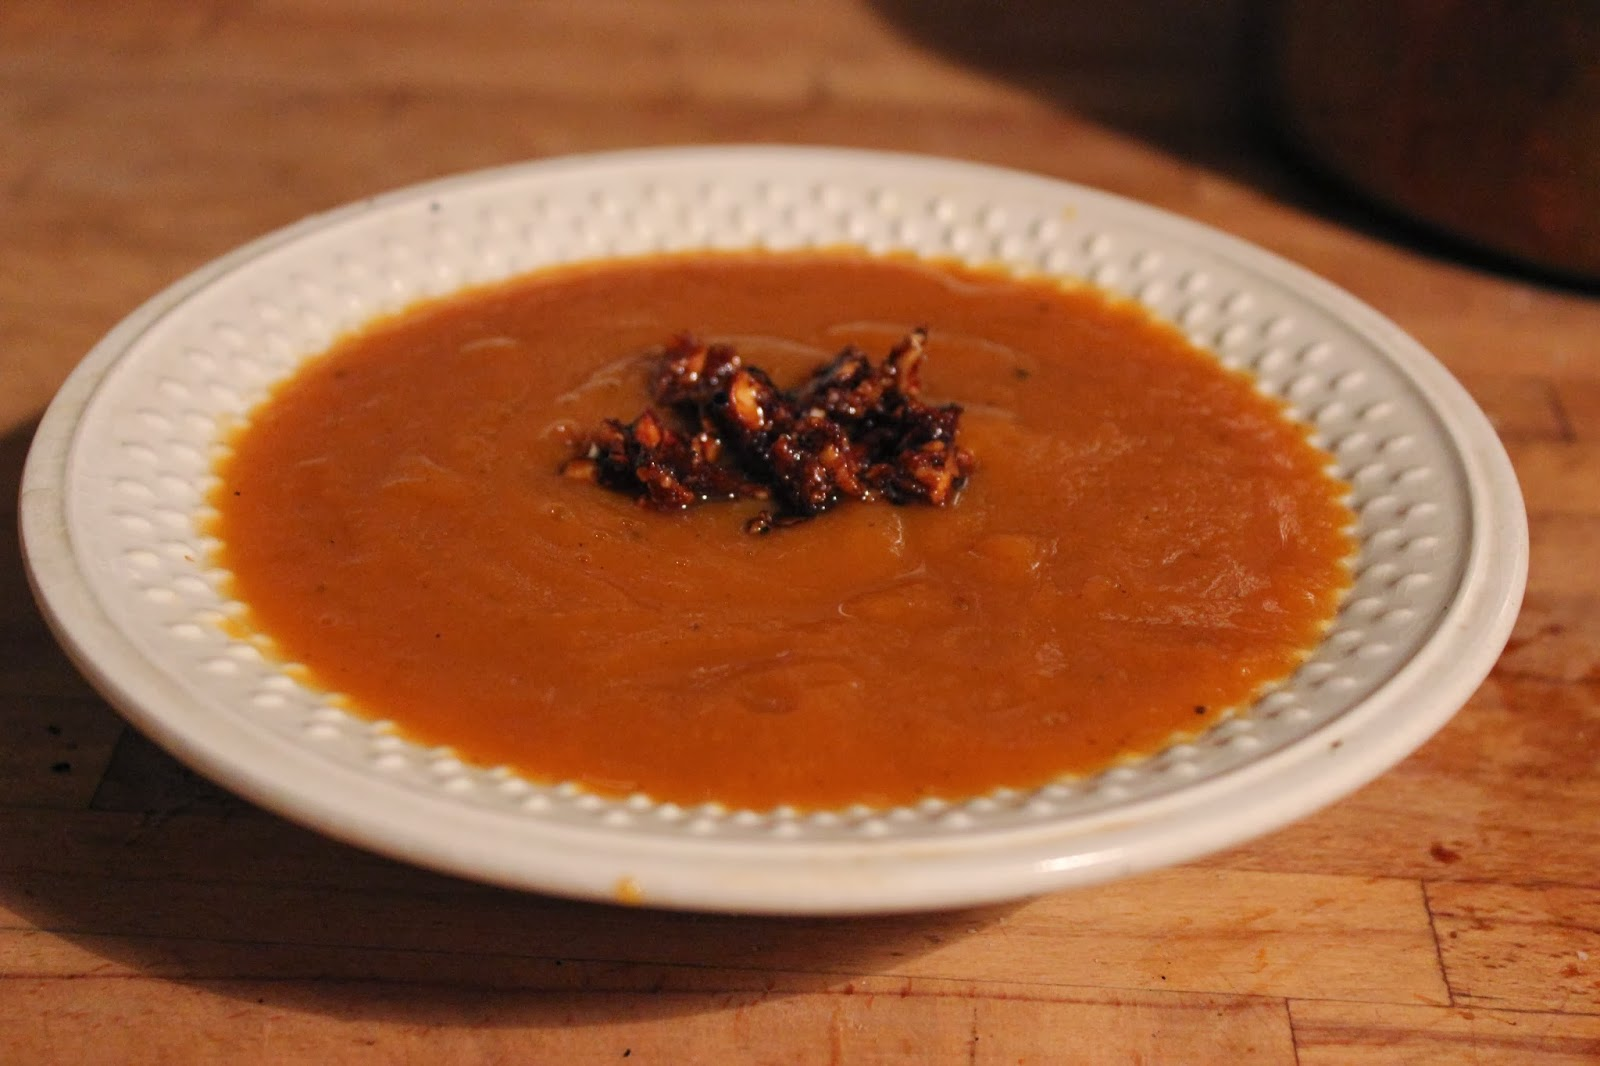 https://cuillereetsaladier.blogspot.com/2013/12/soupe-de-potiron-croustillante.html